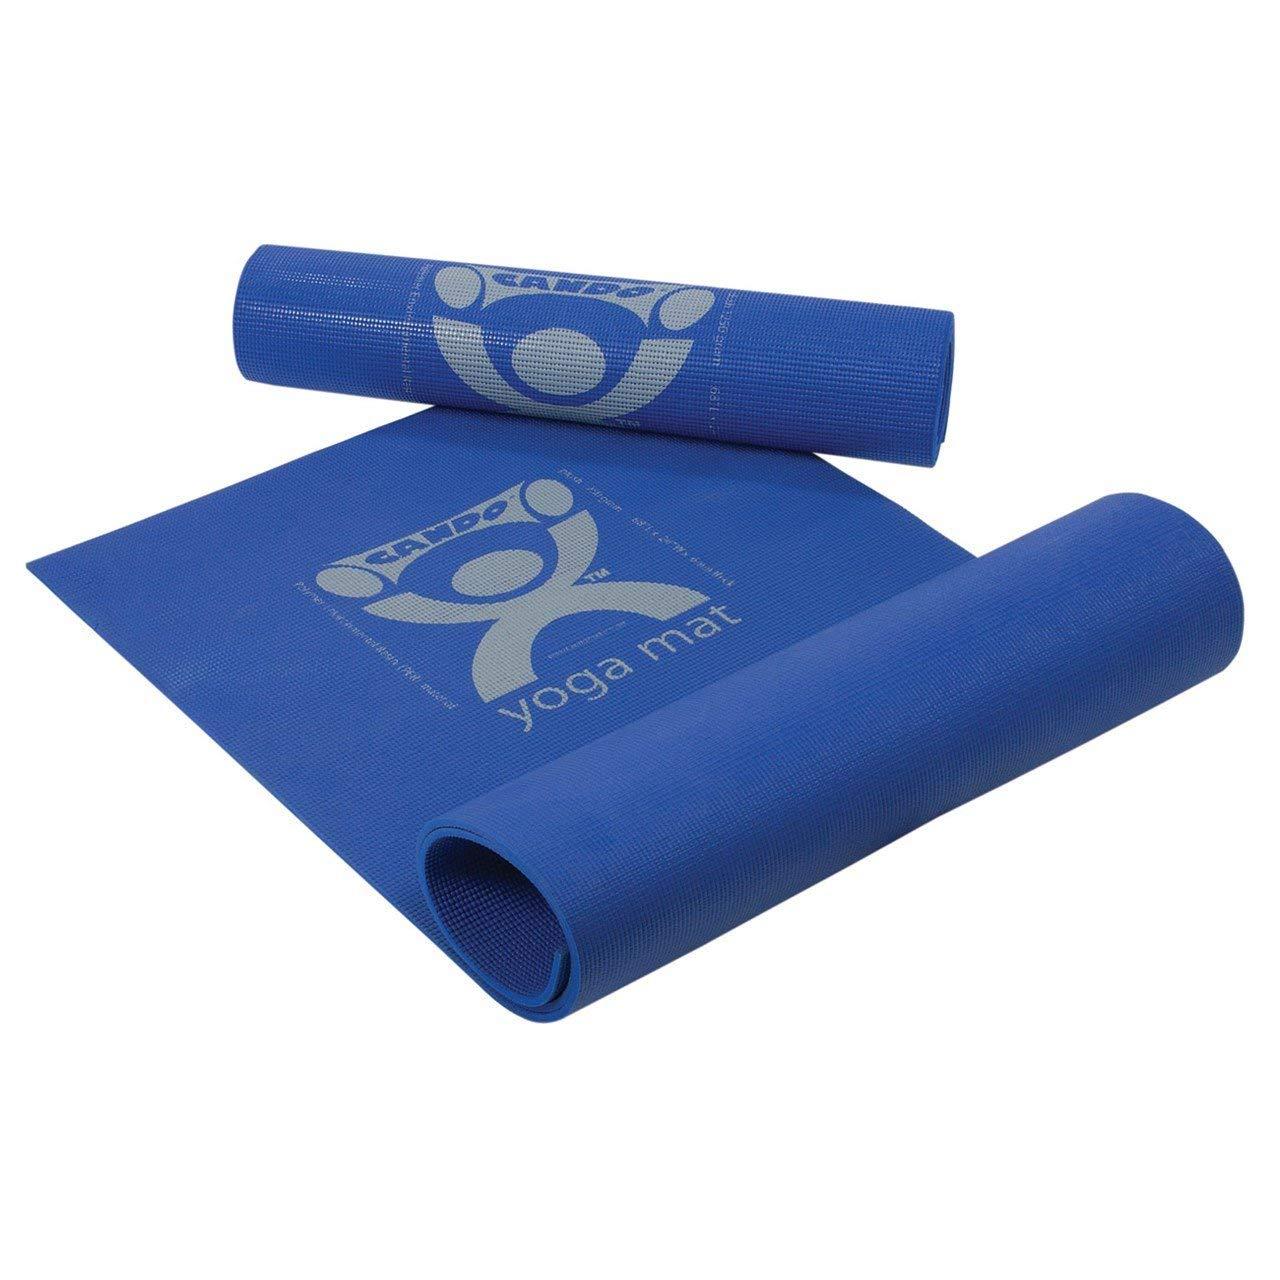 "CanDo 30-2401B Exercise Polymer Environmental Resin Yoga Mat, 68"" x 24"" x 0.25"", Blue"